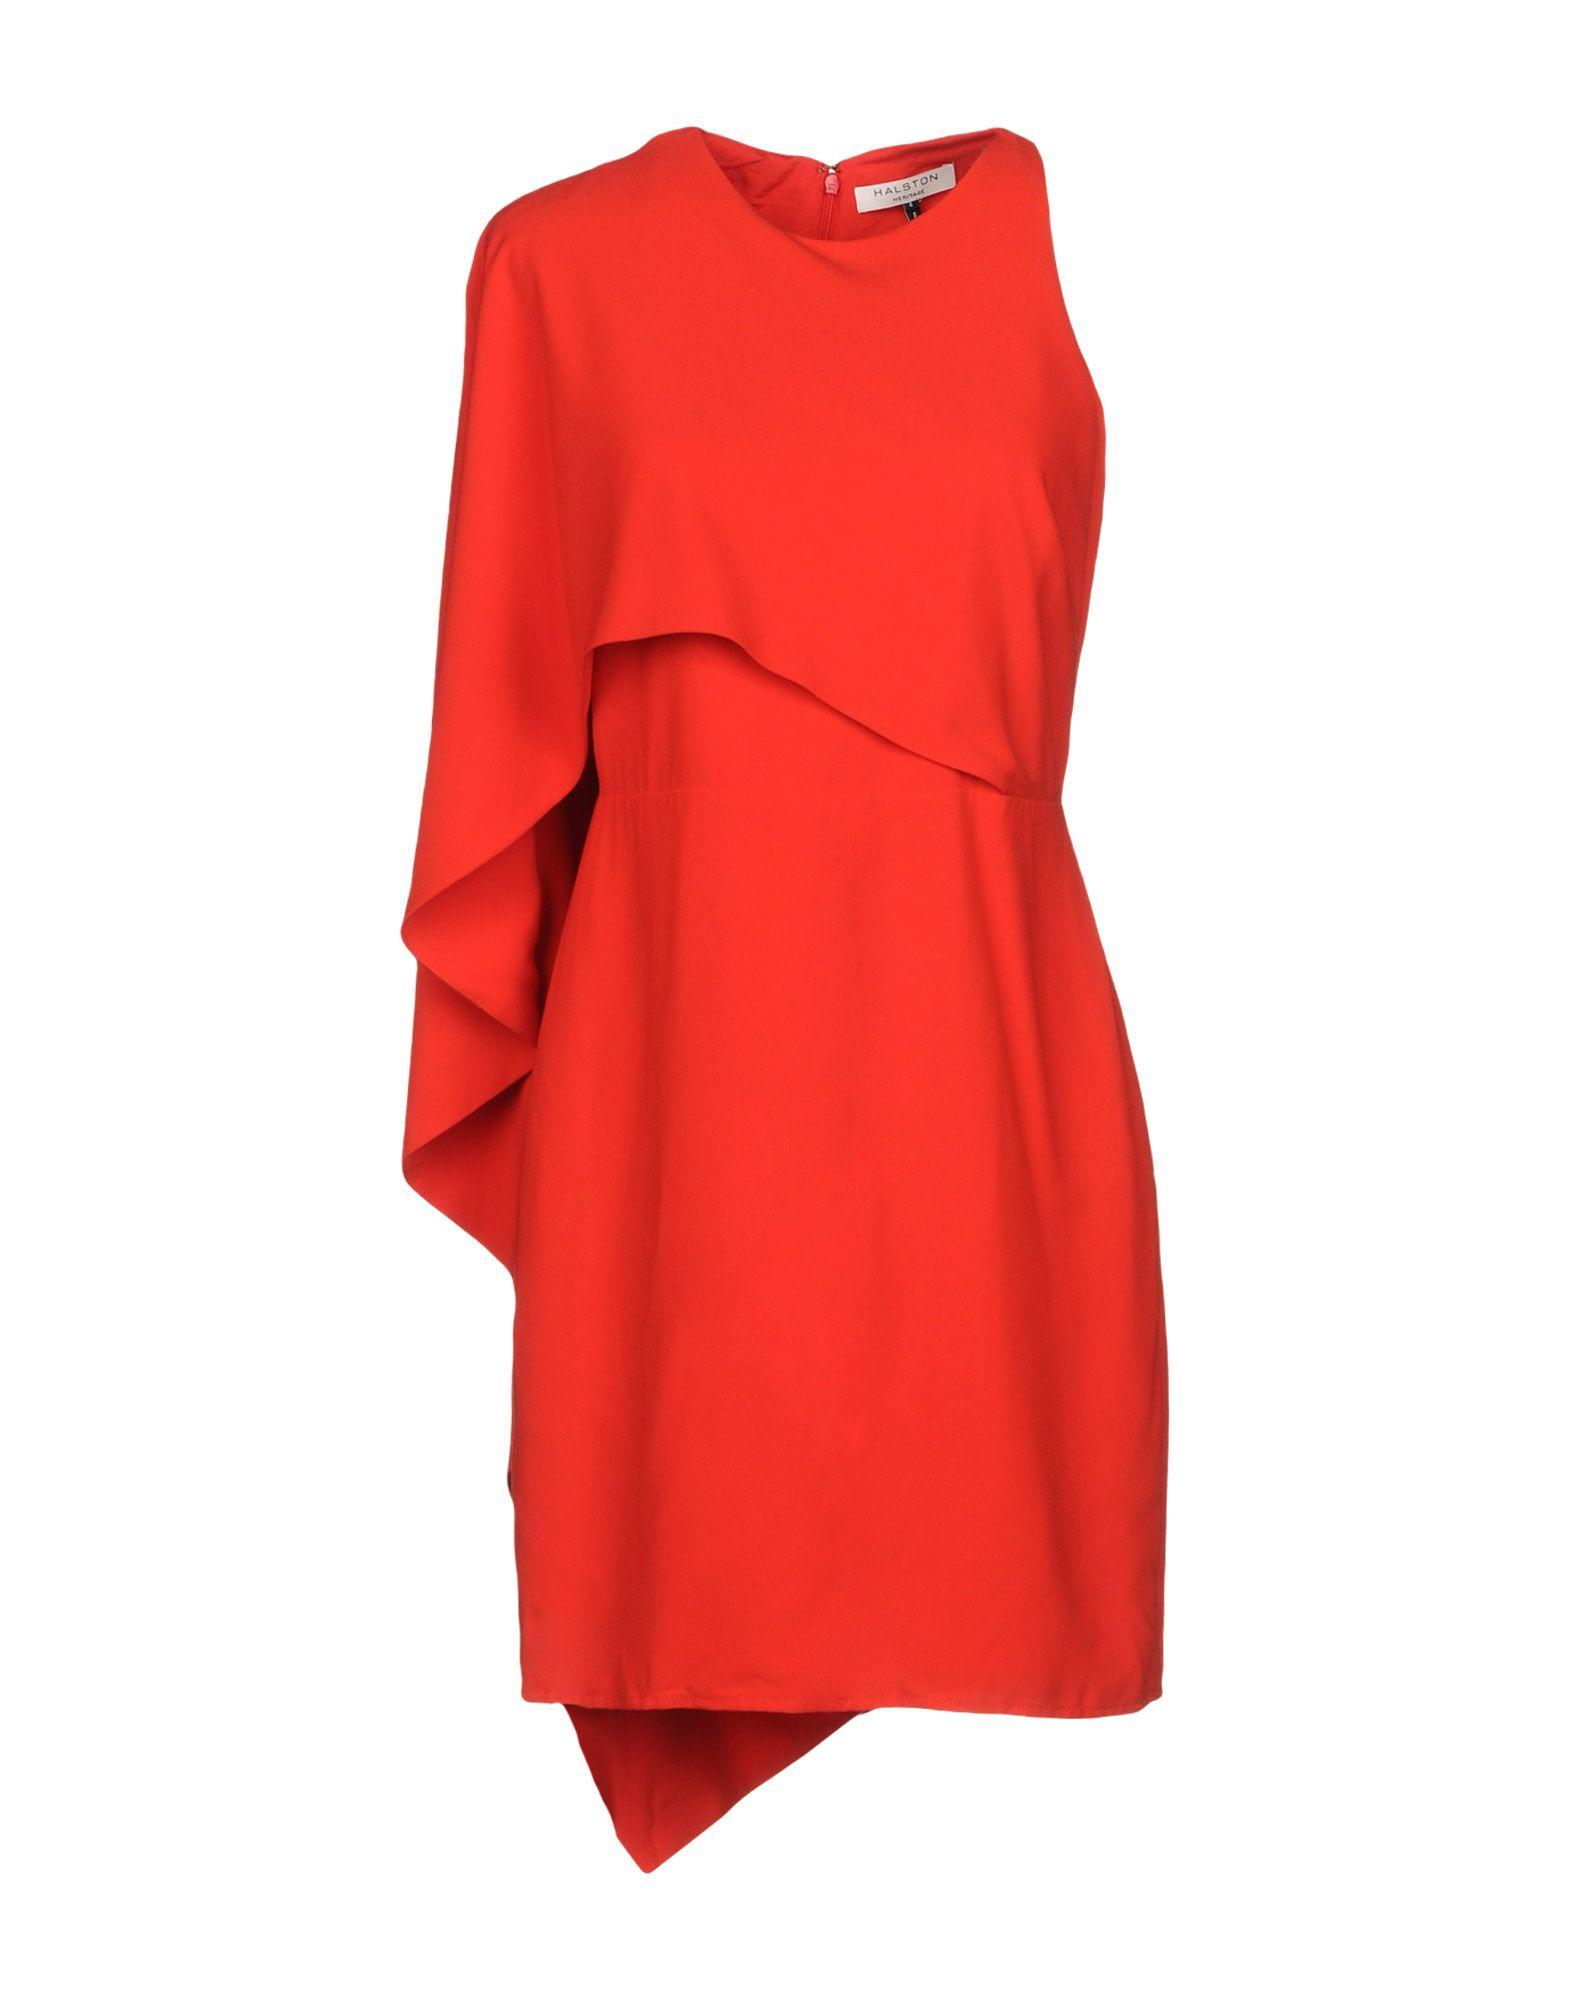 Halston Heritage Short Dress In Red